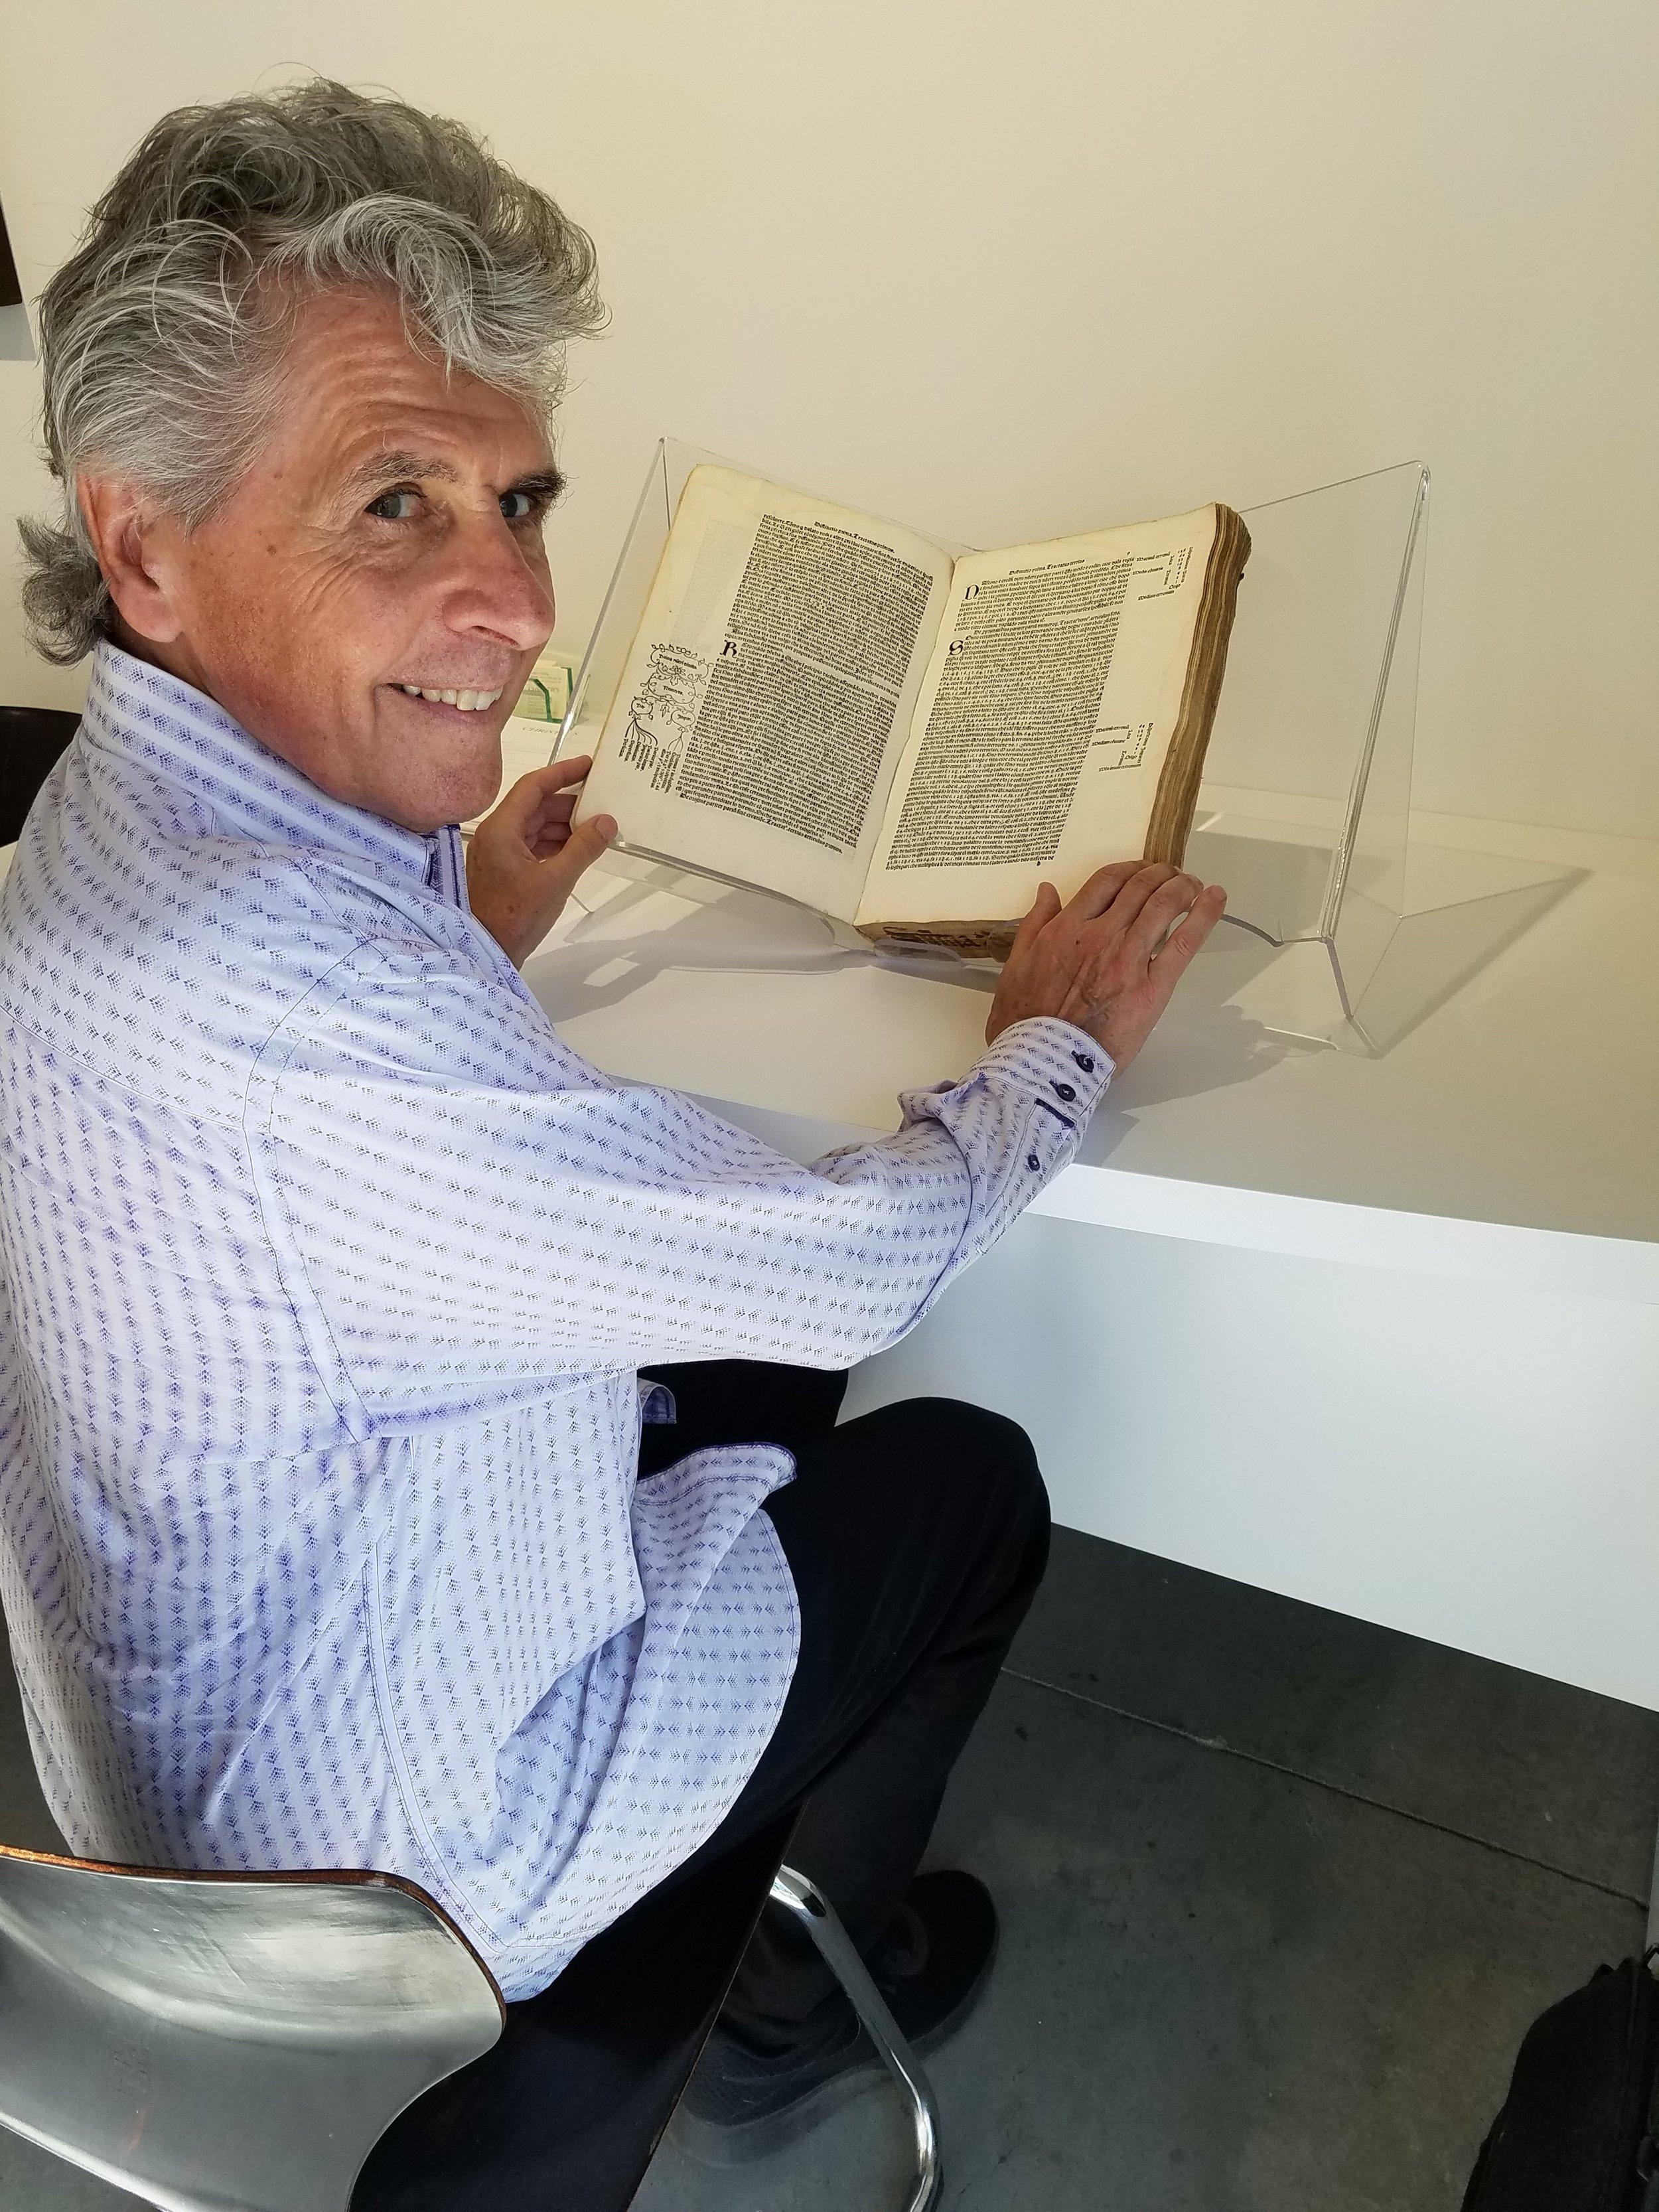 Examining a first edition copy of Pacioli's book  Summa  (1494)